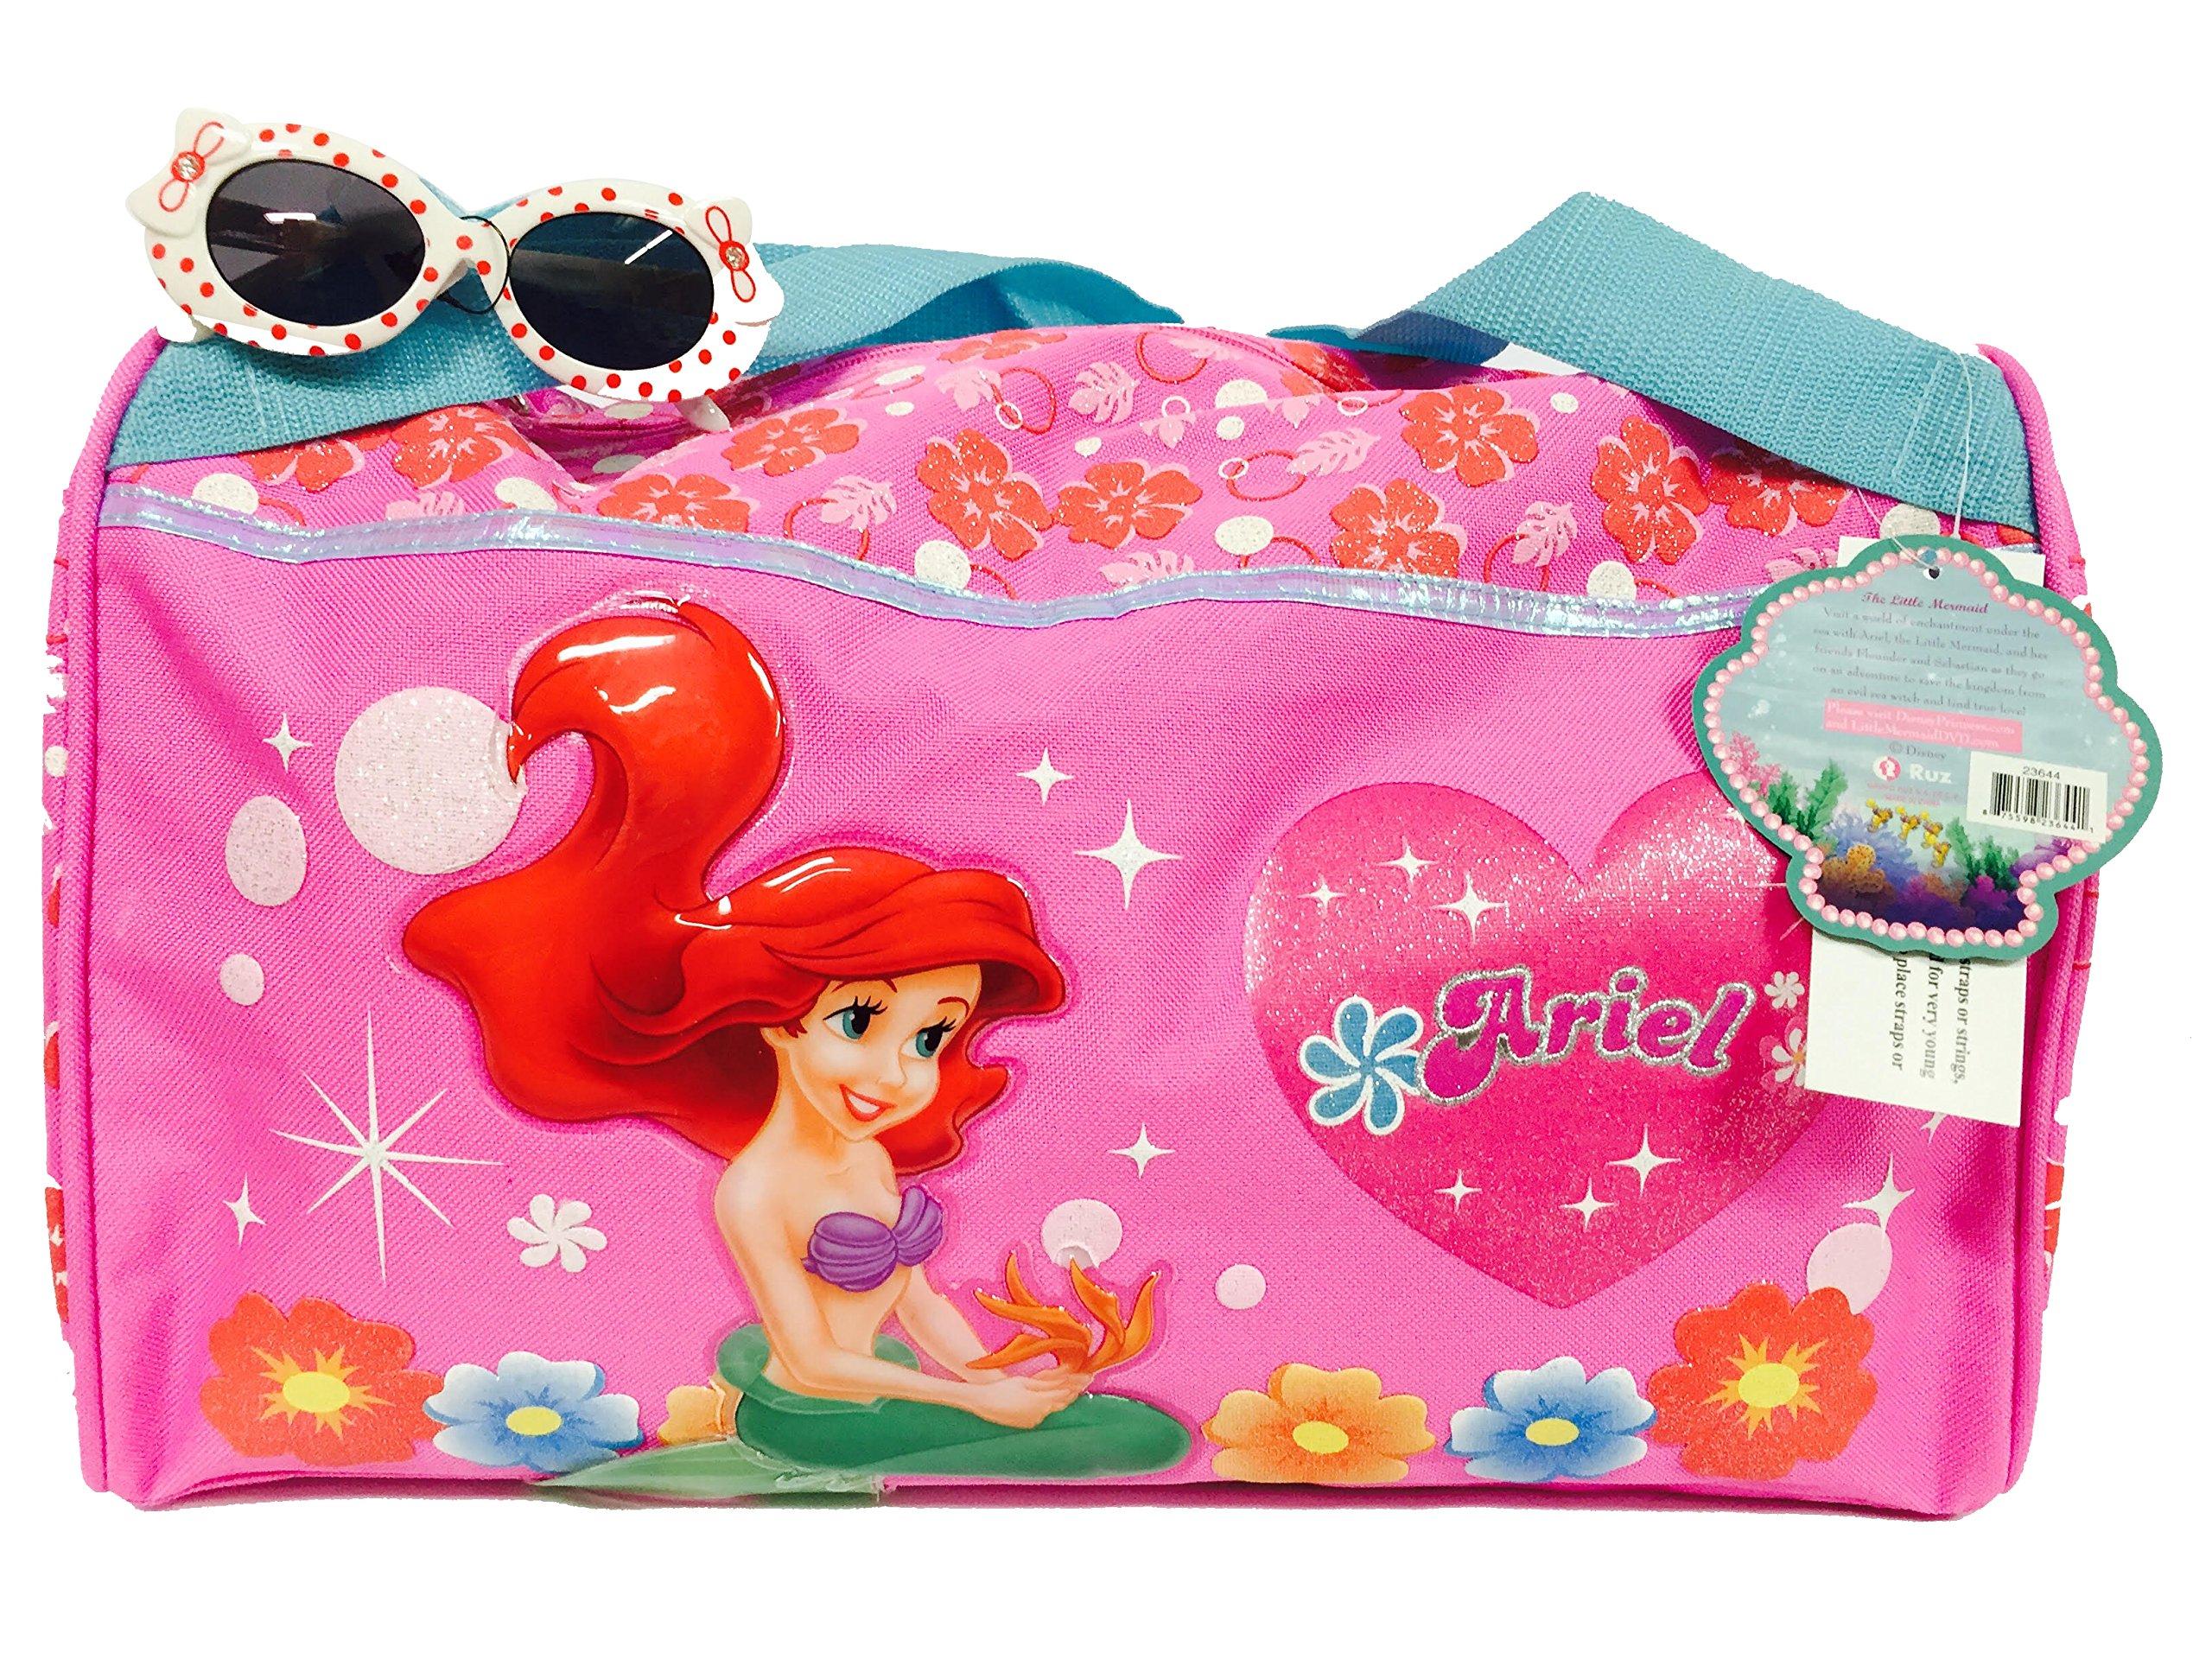 Disney Little Mermaid Ariel Duffle Gym Diaper Bag and One Stylish Sunglasses Set